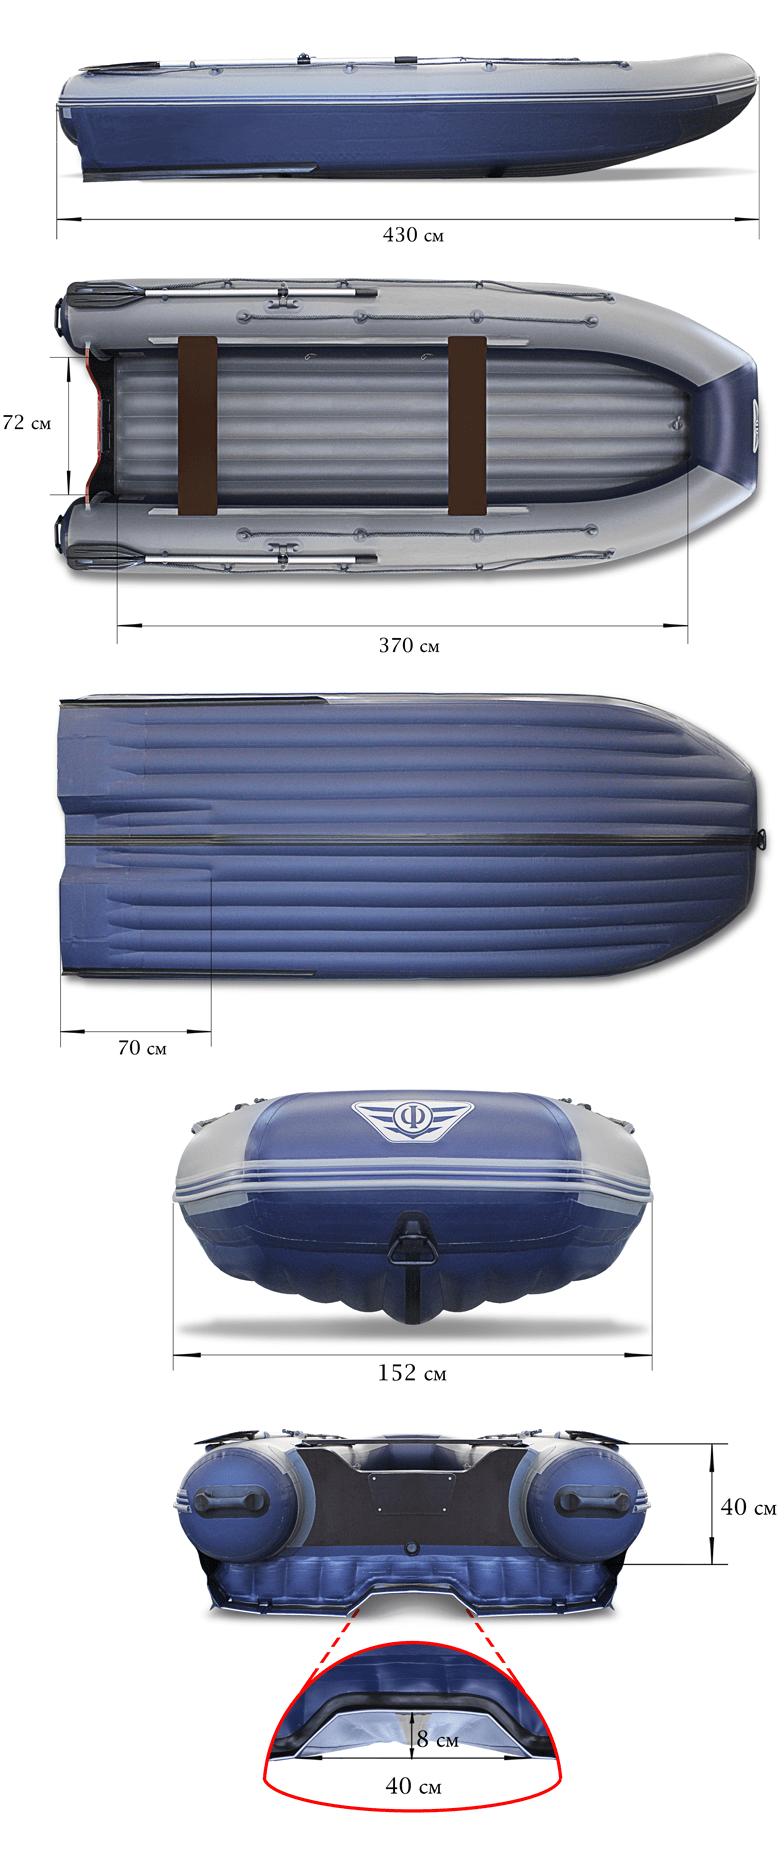 ФЛАГМАН DK 430i Jet